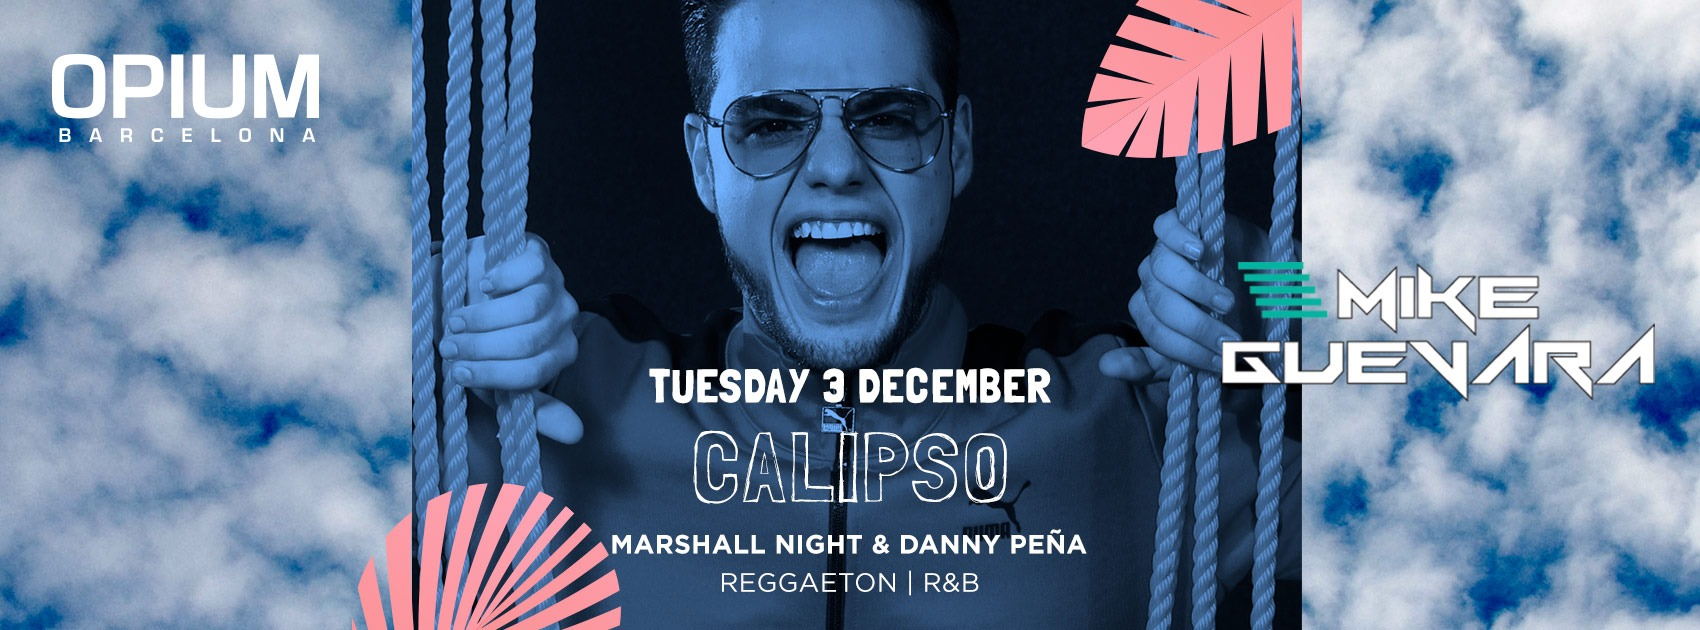 Calipso | Reggaeton & RnB - Club Opium Barcelona